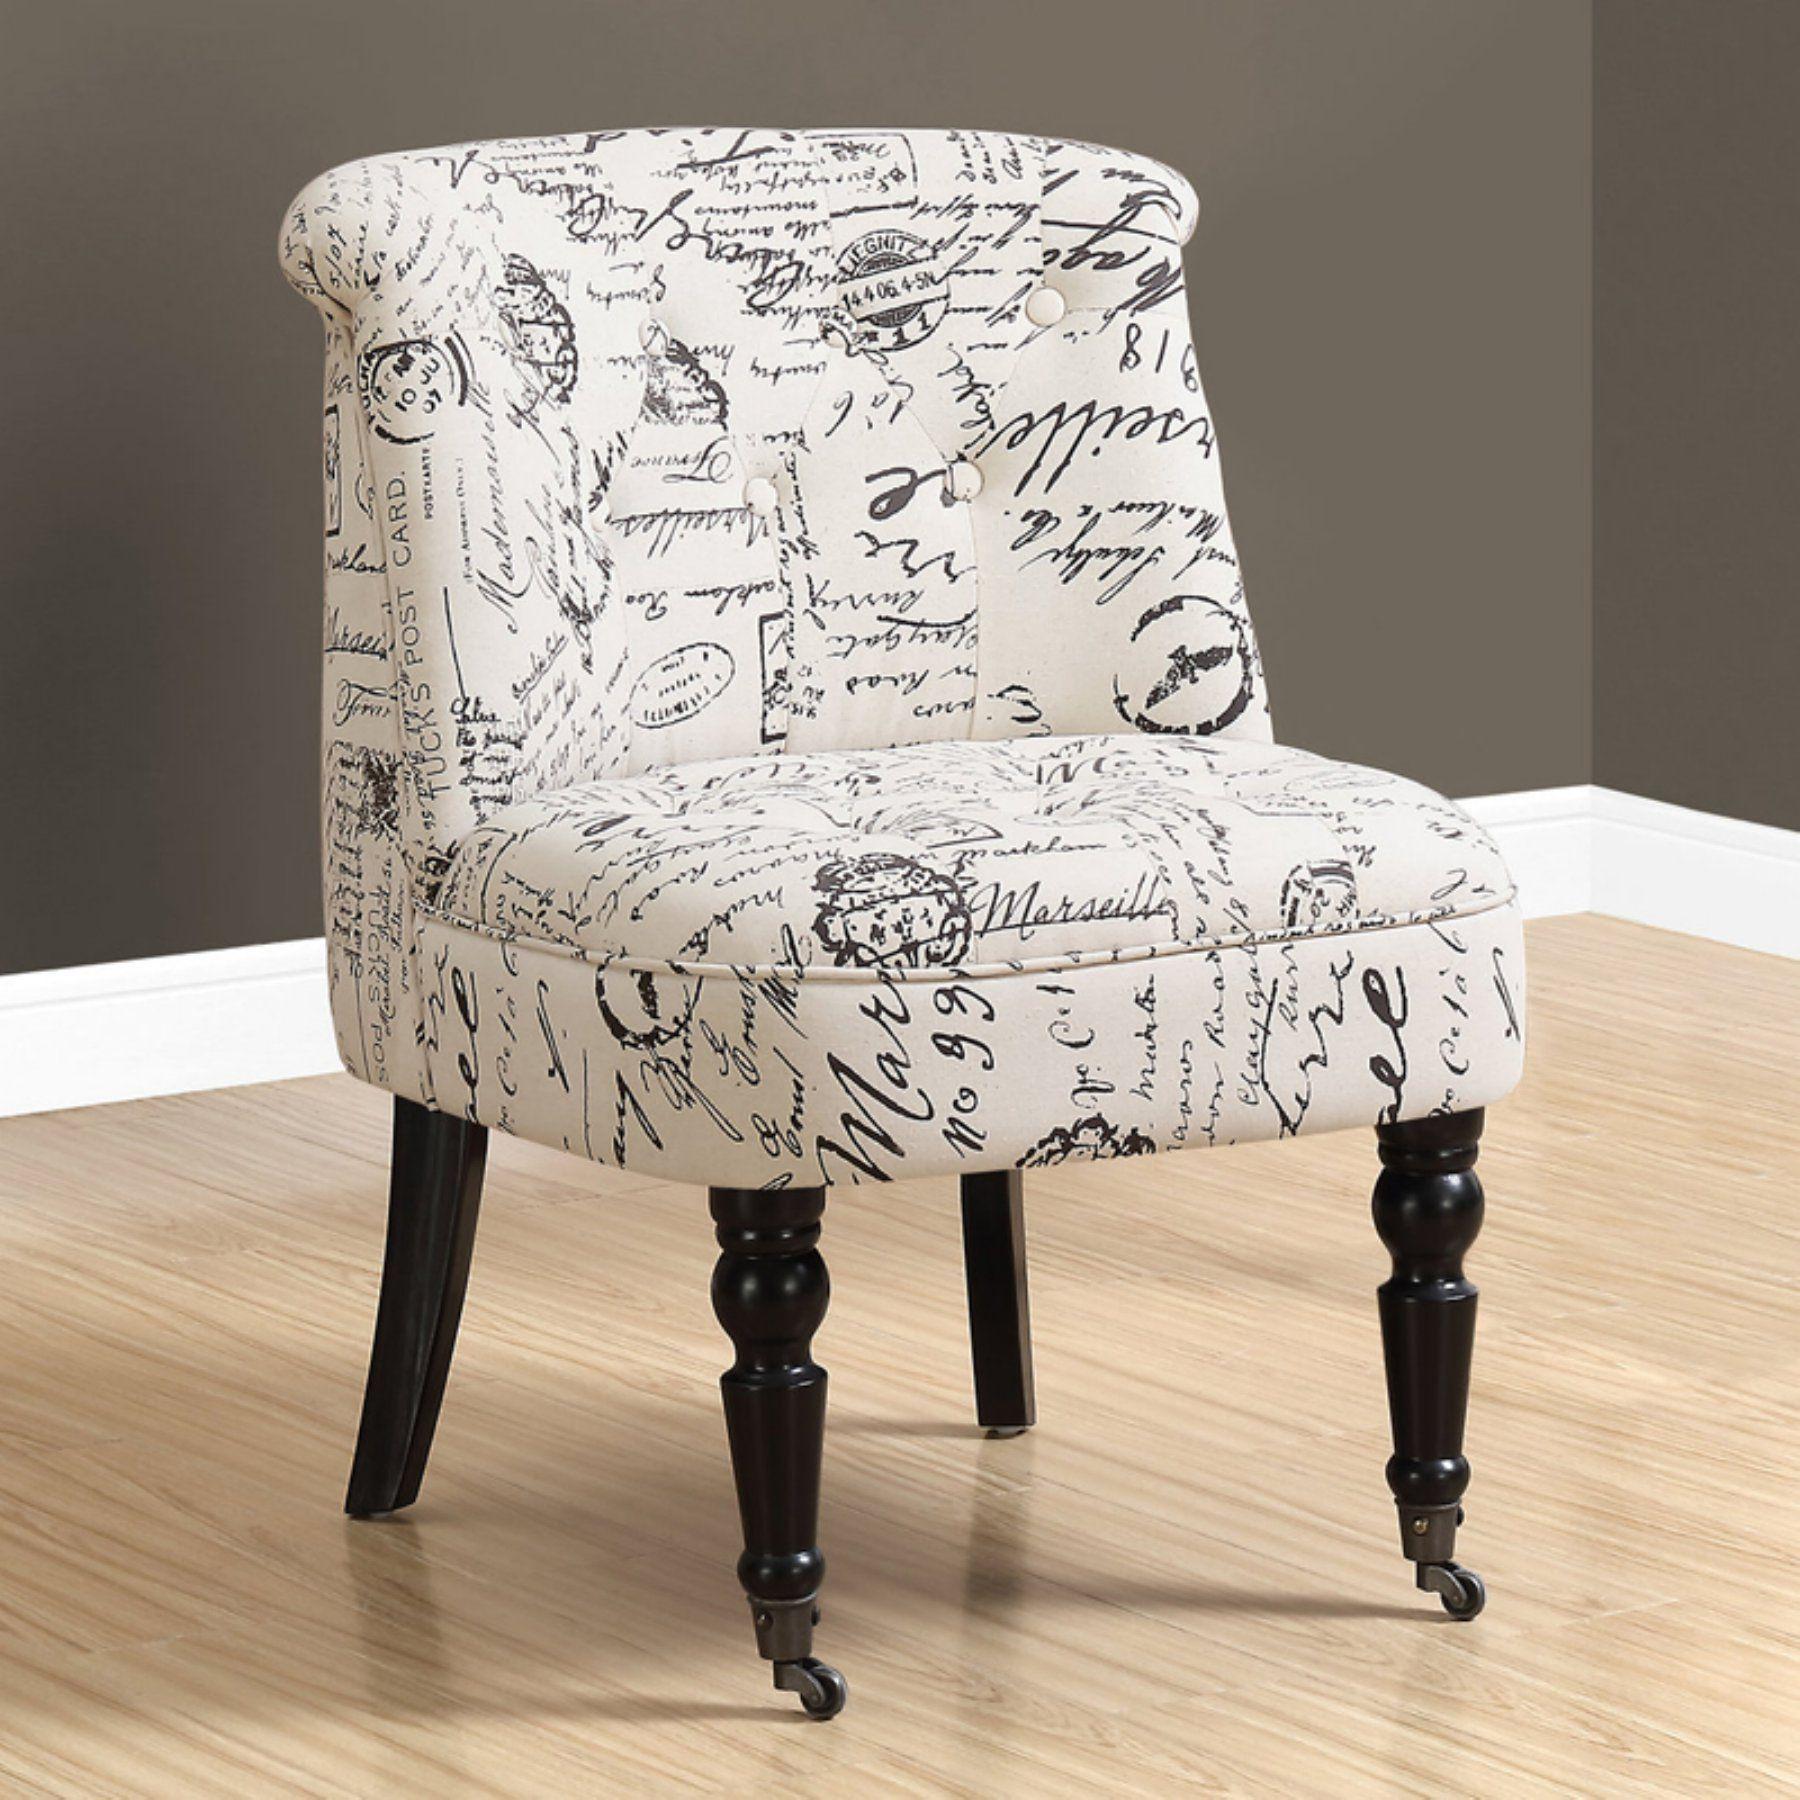 Surprising Monarch Specialties Vintage French Accent Chair In 2019 Inzonedesignstudio Interior Chair Design Inzonedesignstudiocom